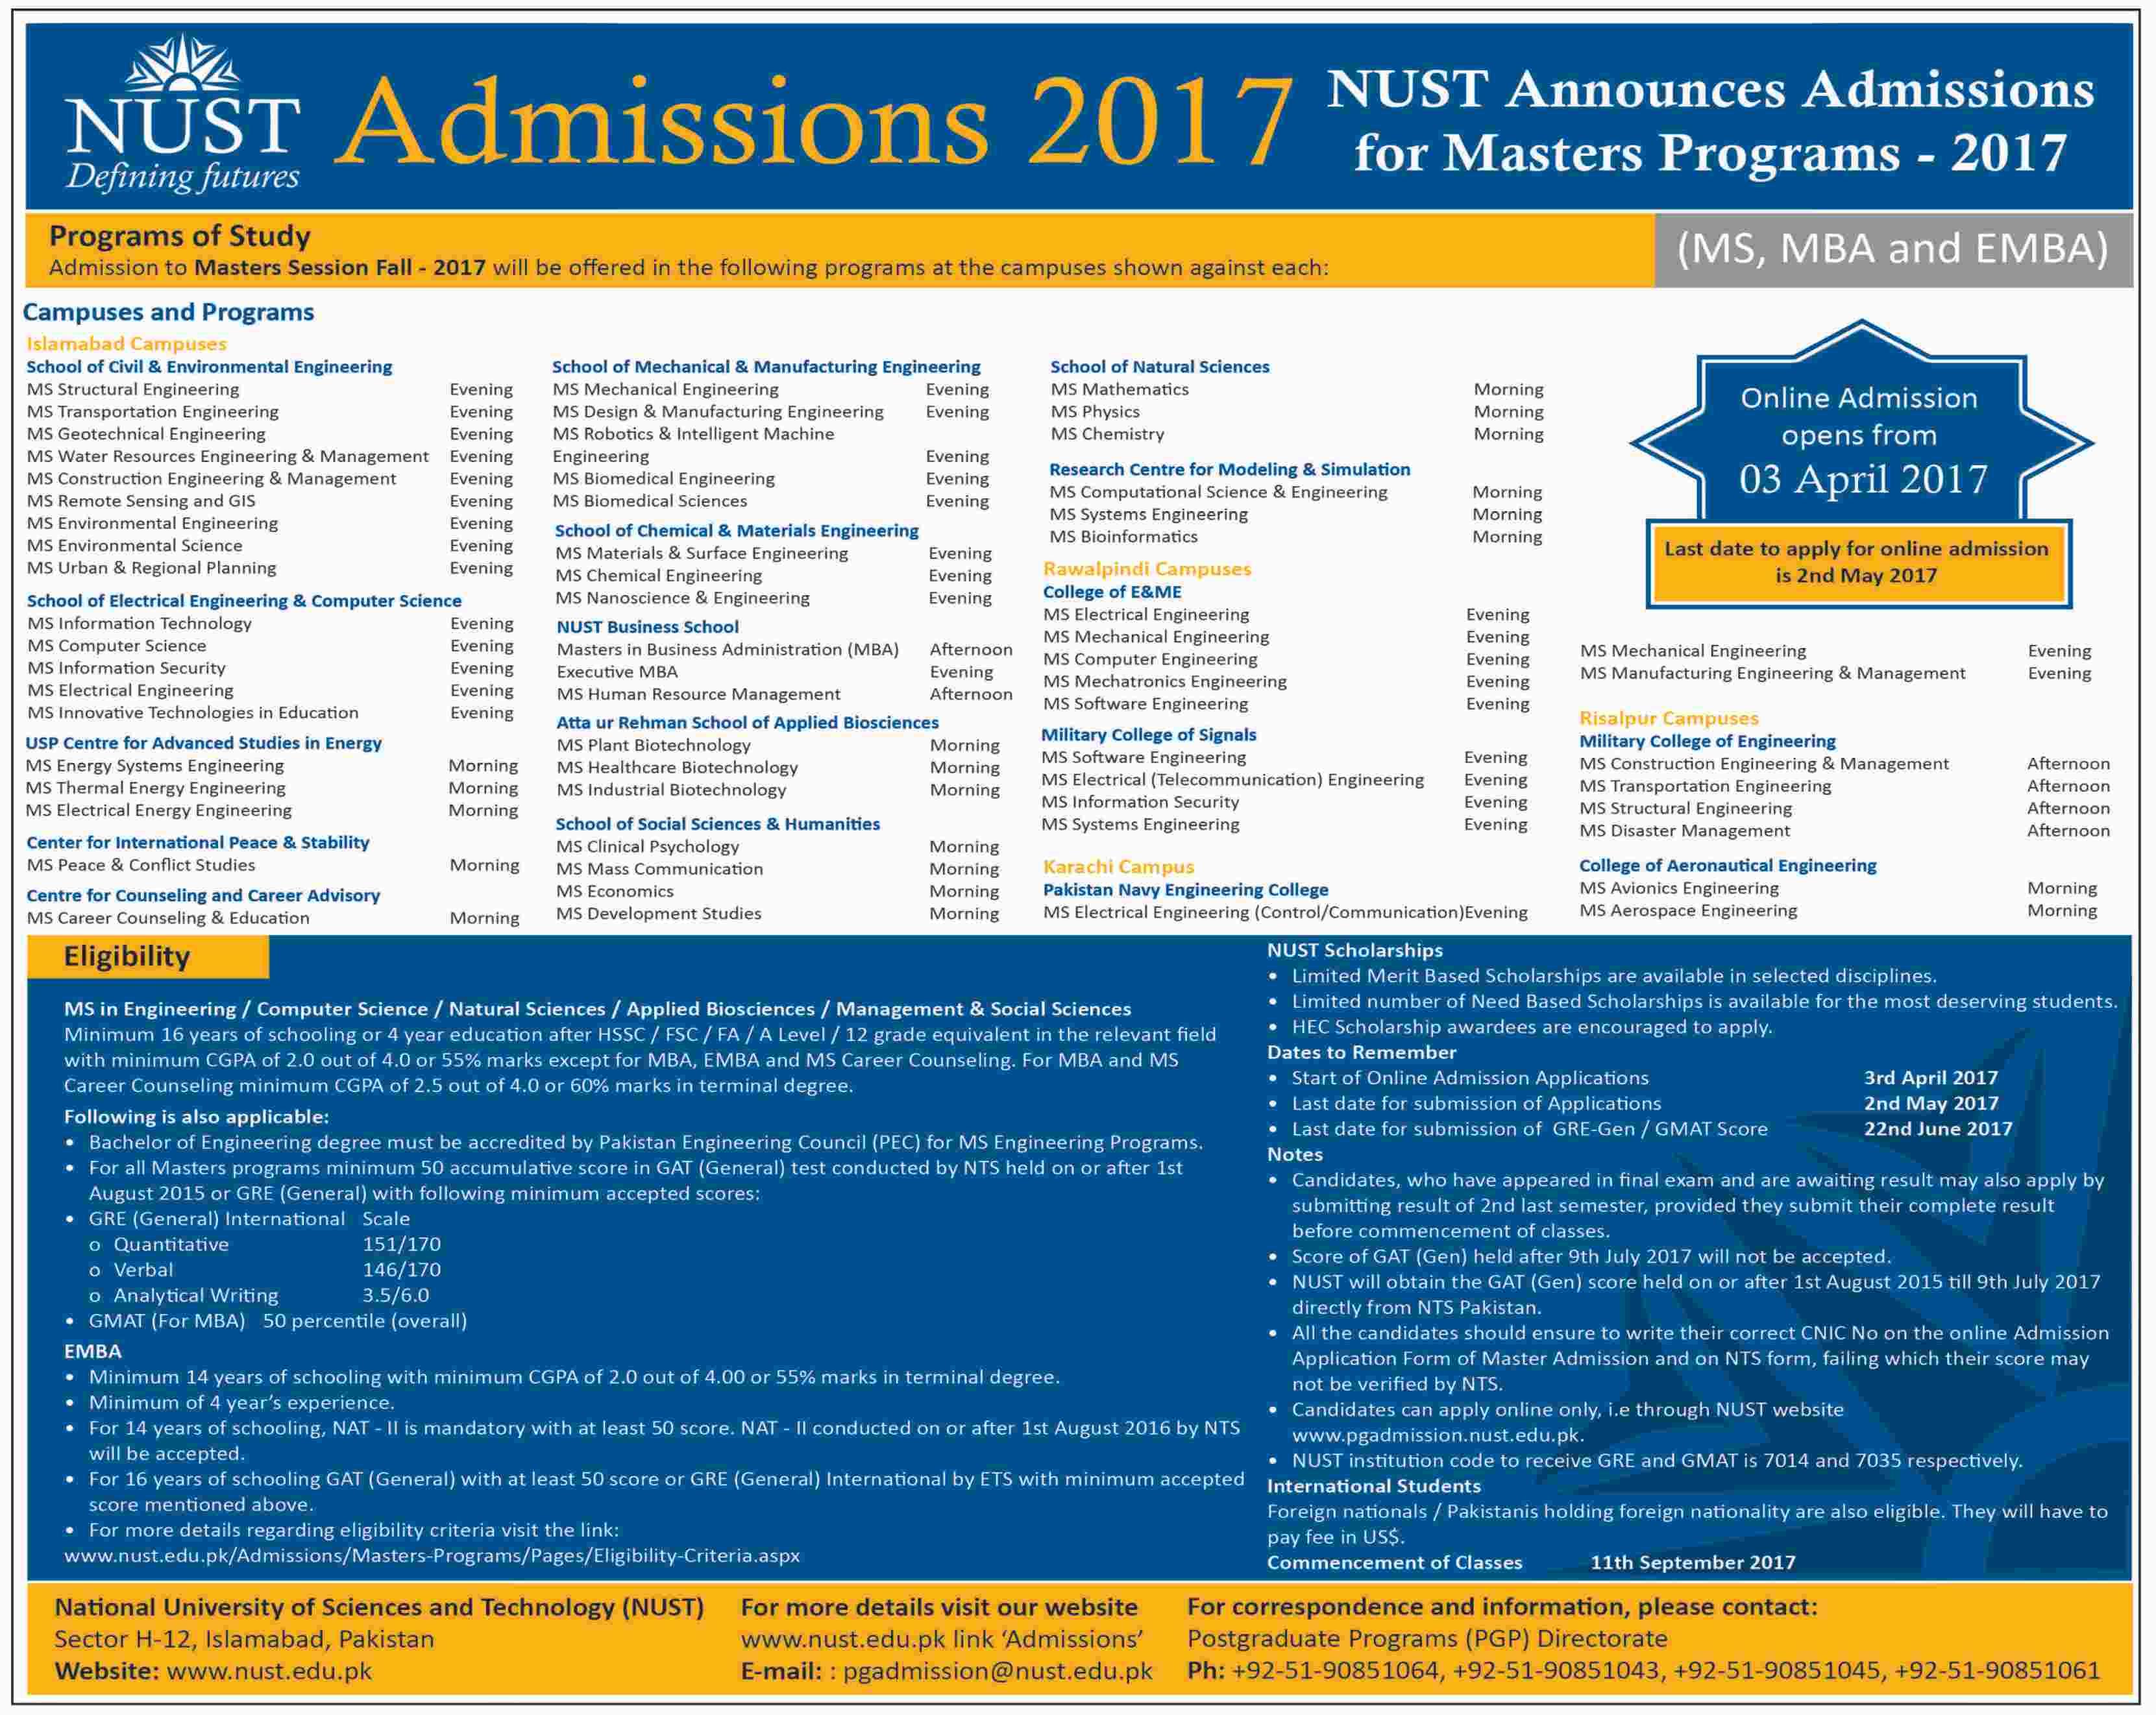 Nust Medical College Admission Form on student admission form, bzu admission form, lums admission form, online admission form, comsats admission form, mba admission form, ned university admission form,